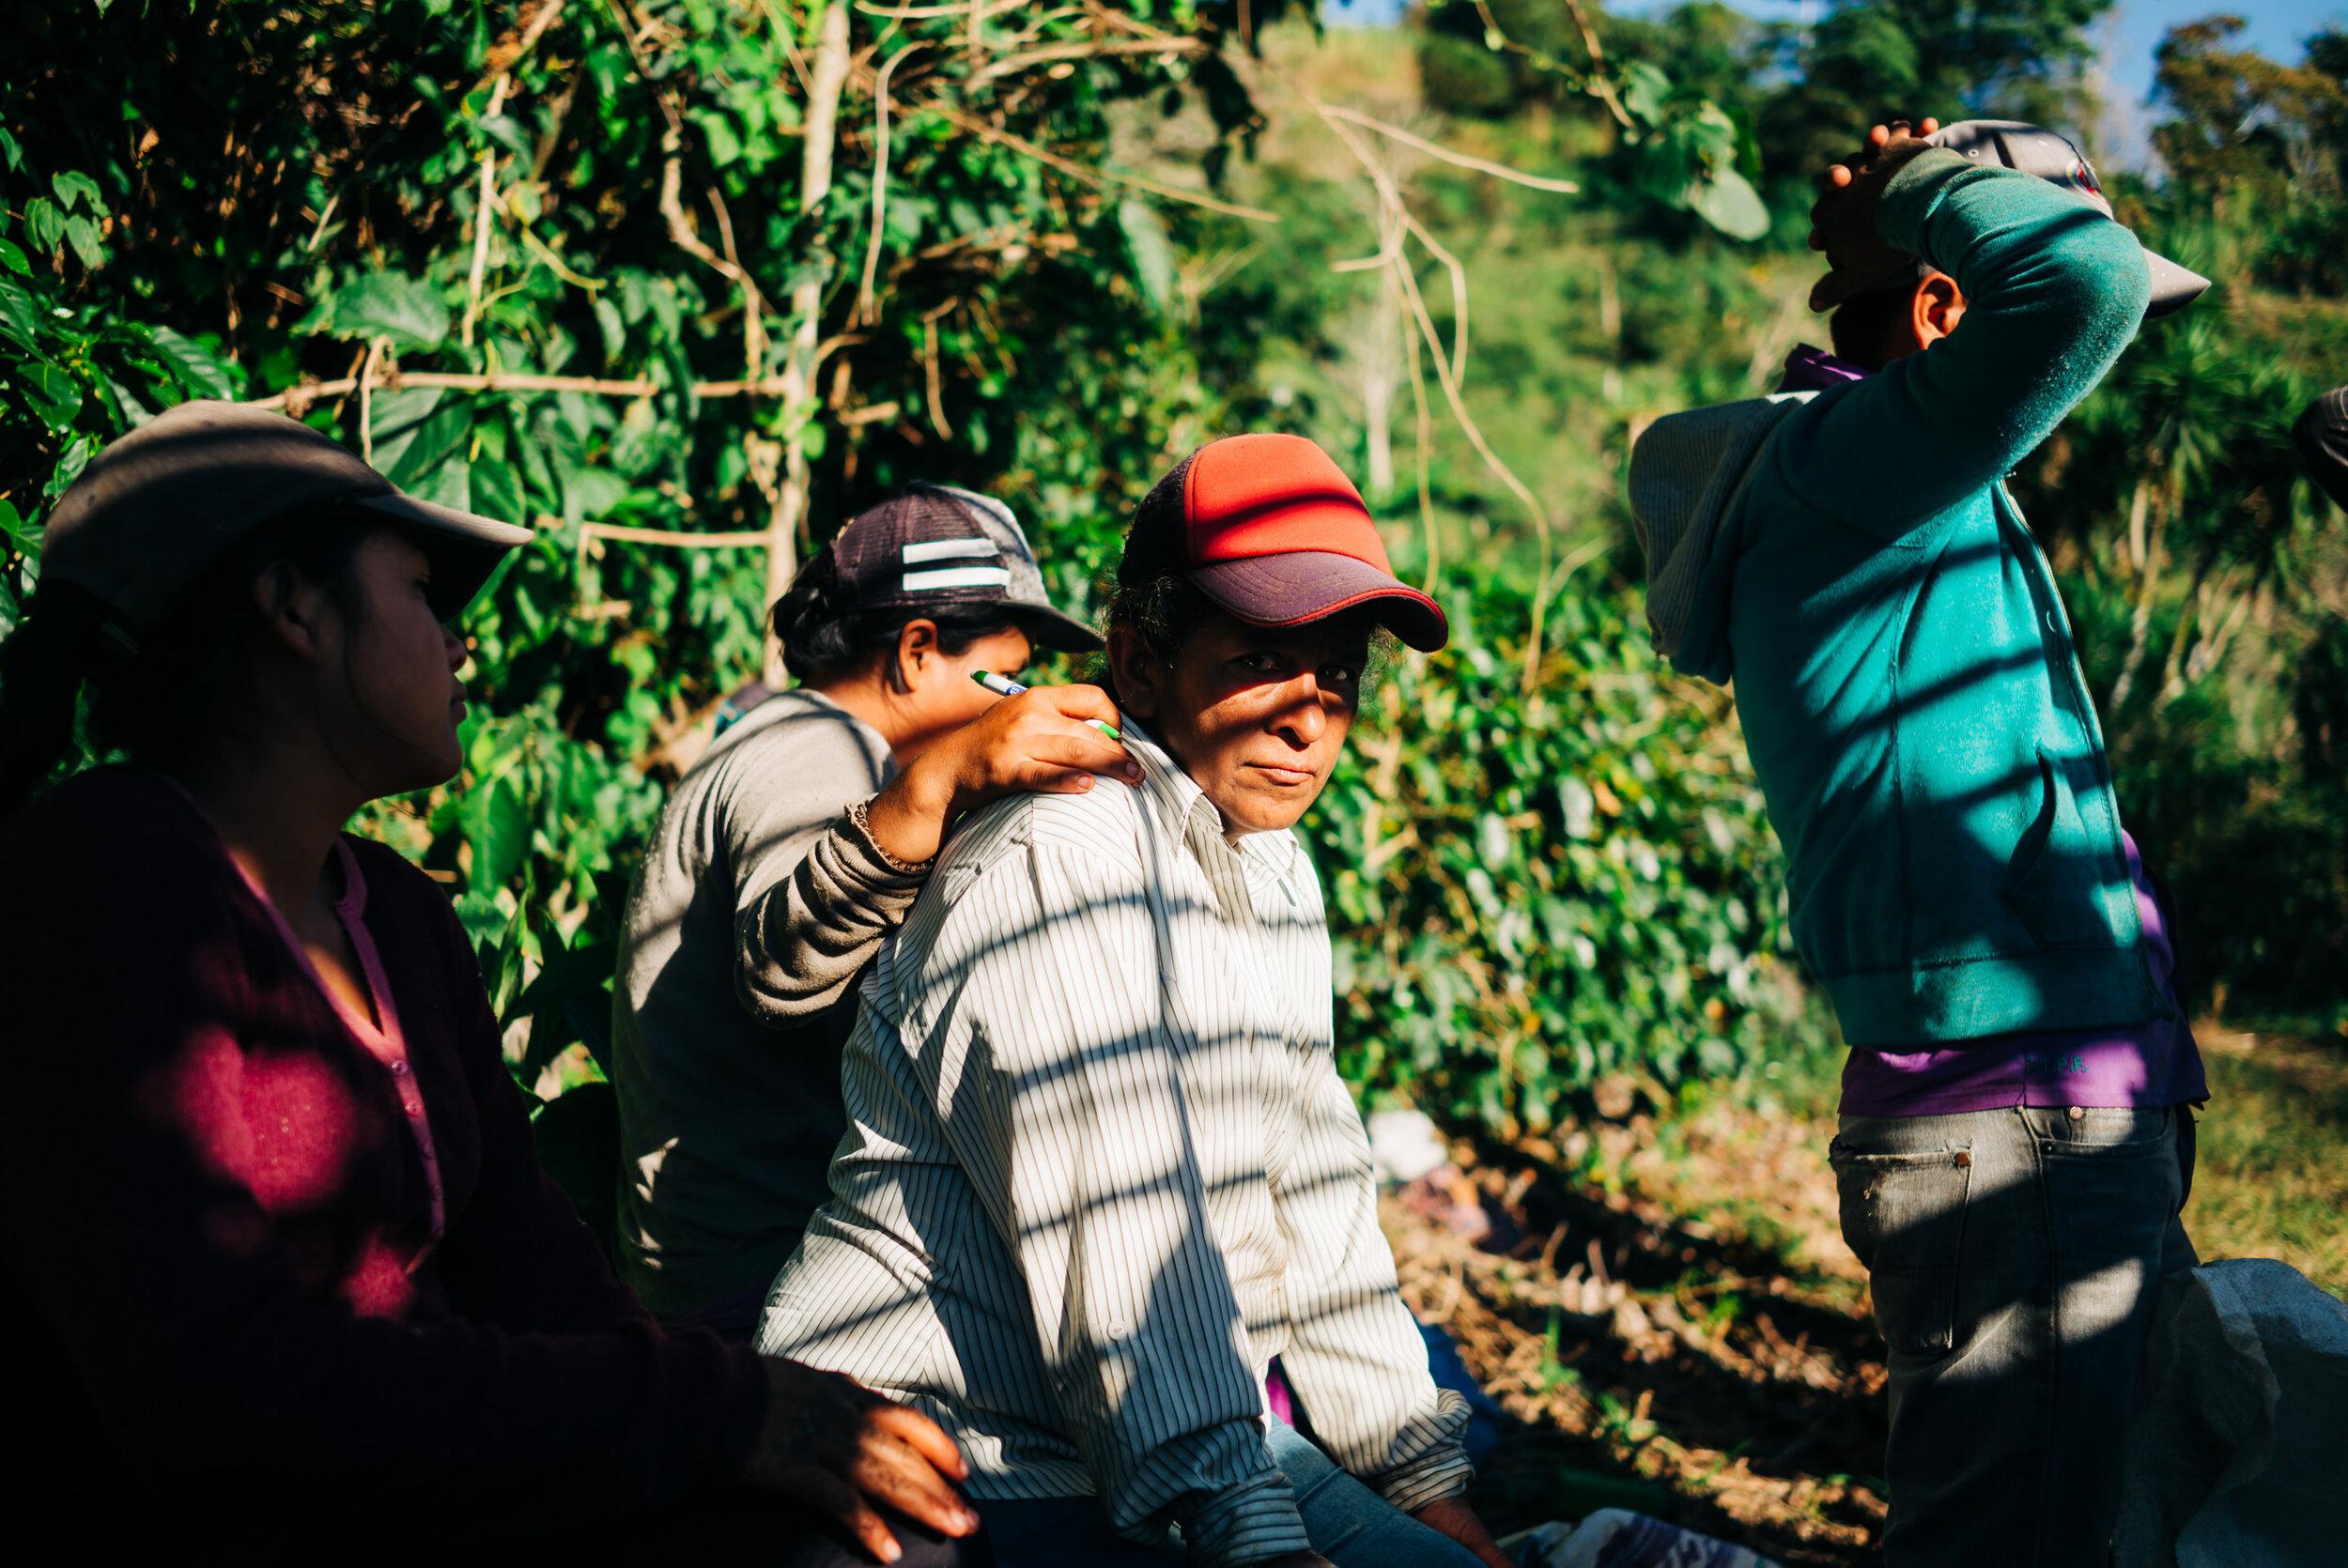 photojournalism-costa-rica-23.JPG